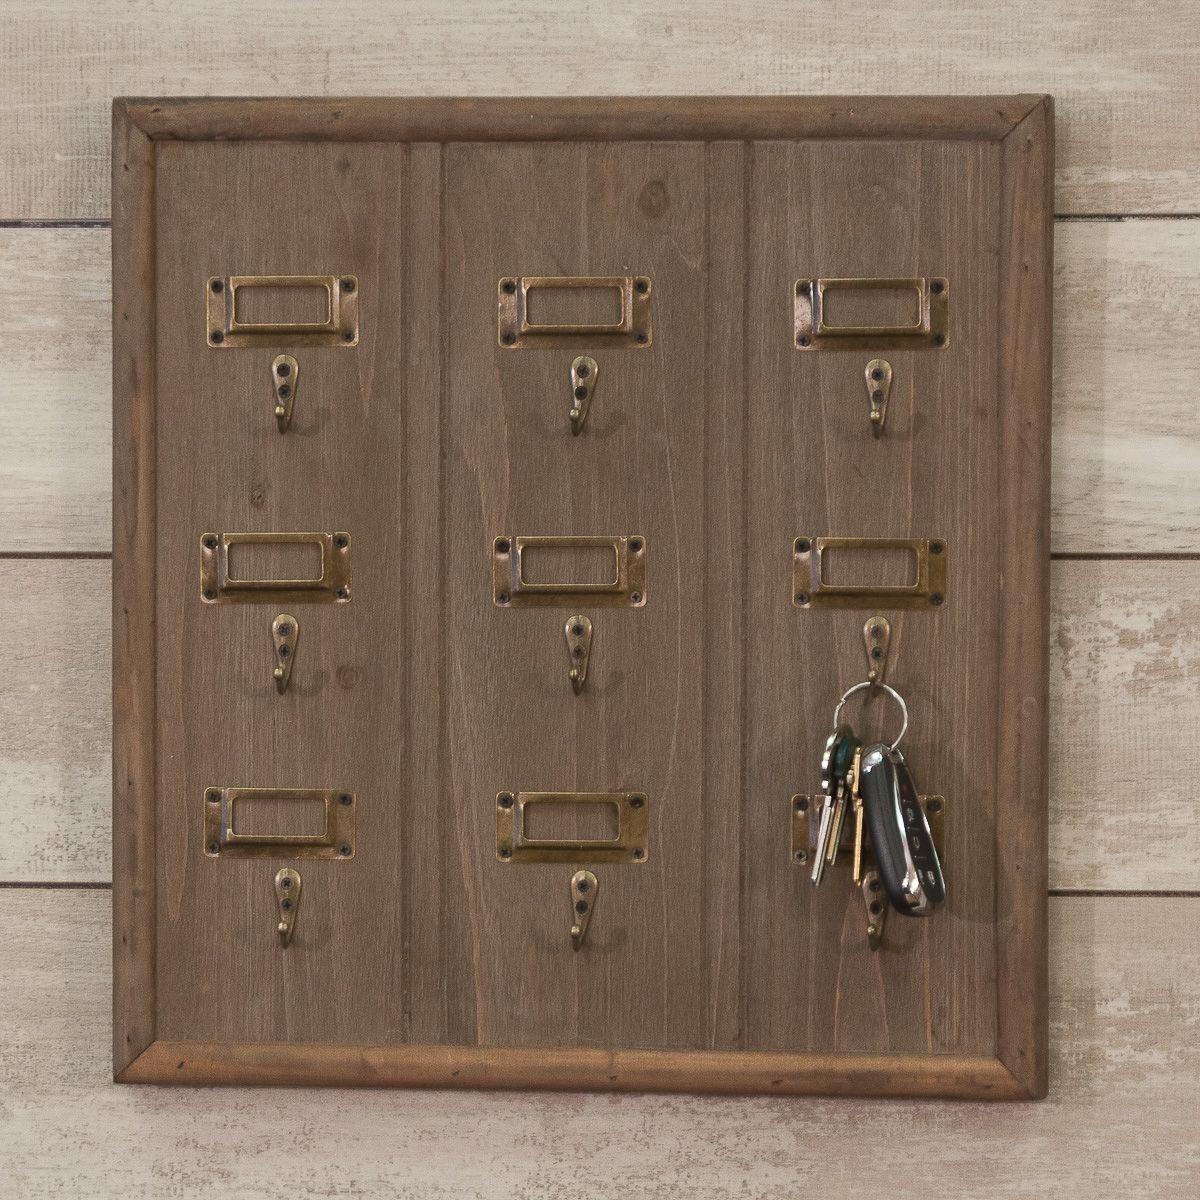 Wooden Key Hook Board Piper Classics Key Hooks Wooden Door Handles